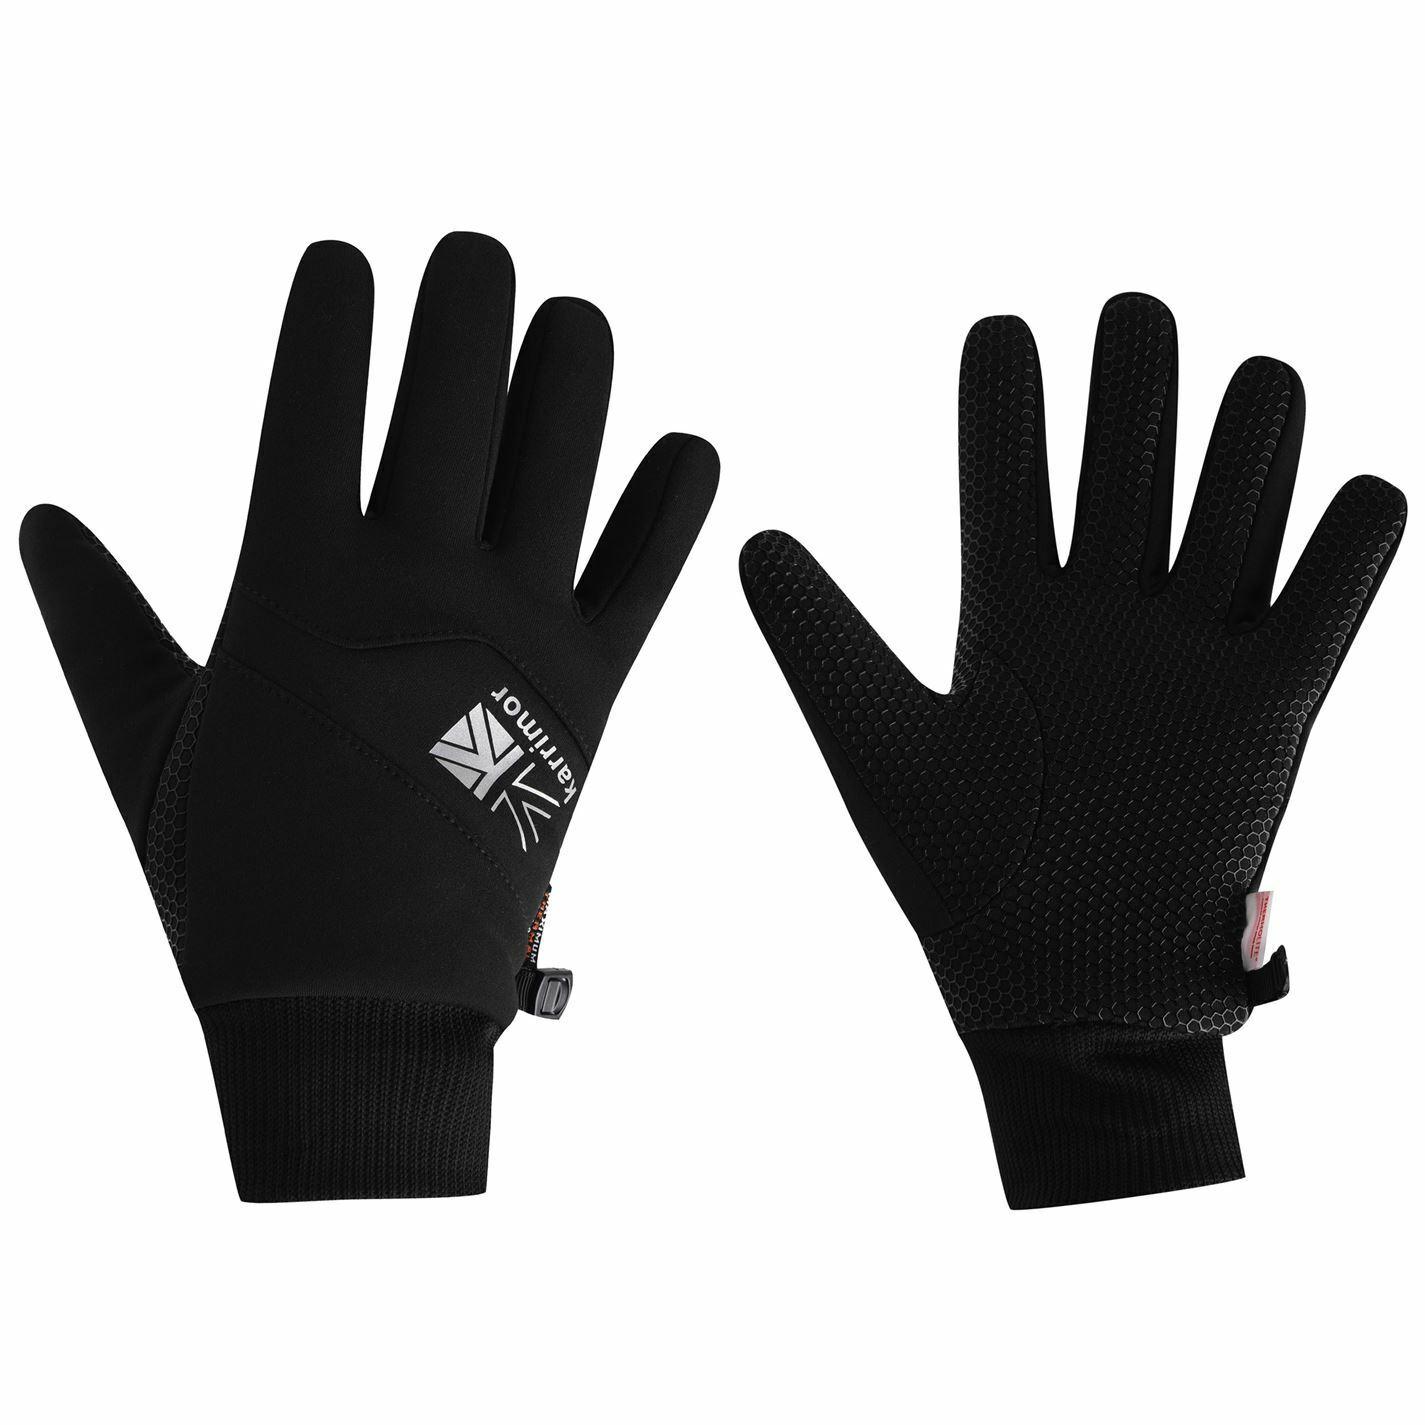 Karrimor Mens Gloves Walking Running Silicone Grip Pattern Winter Accessory